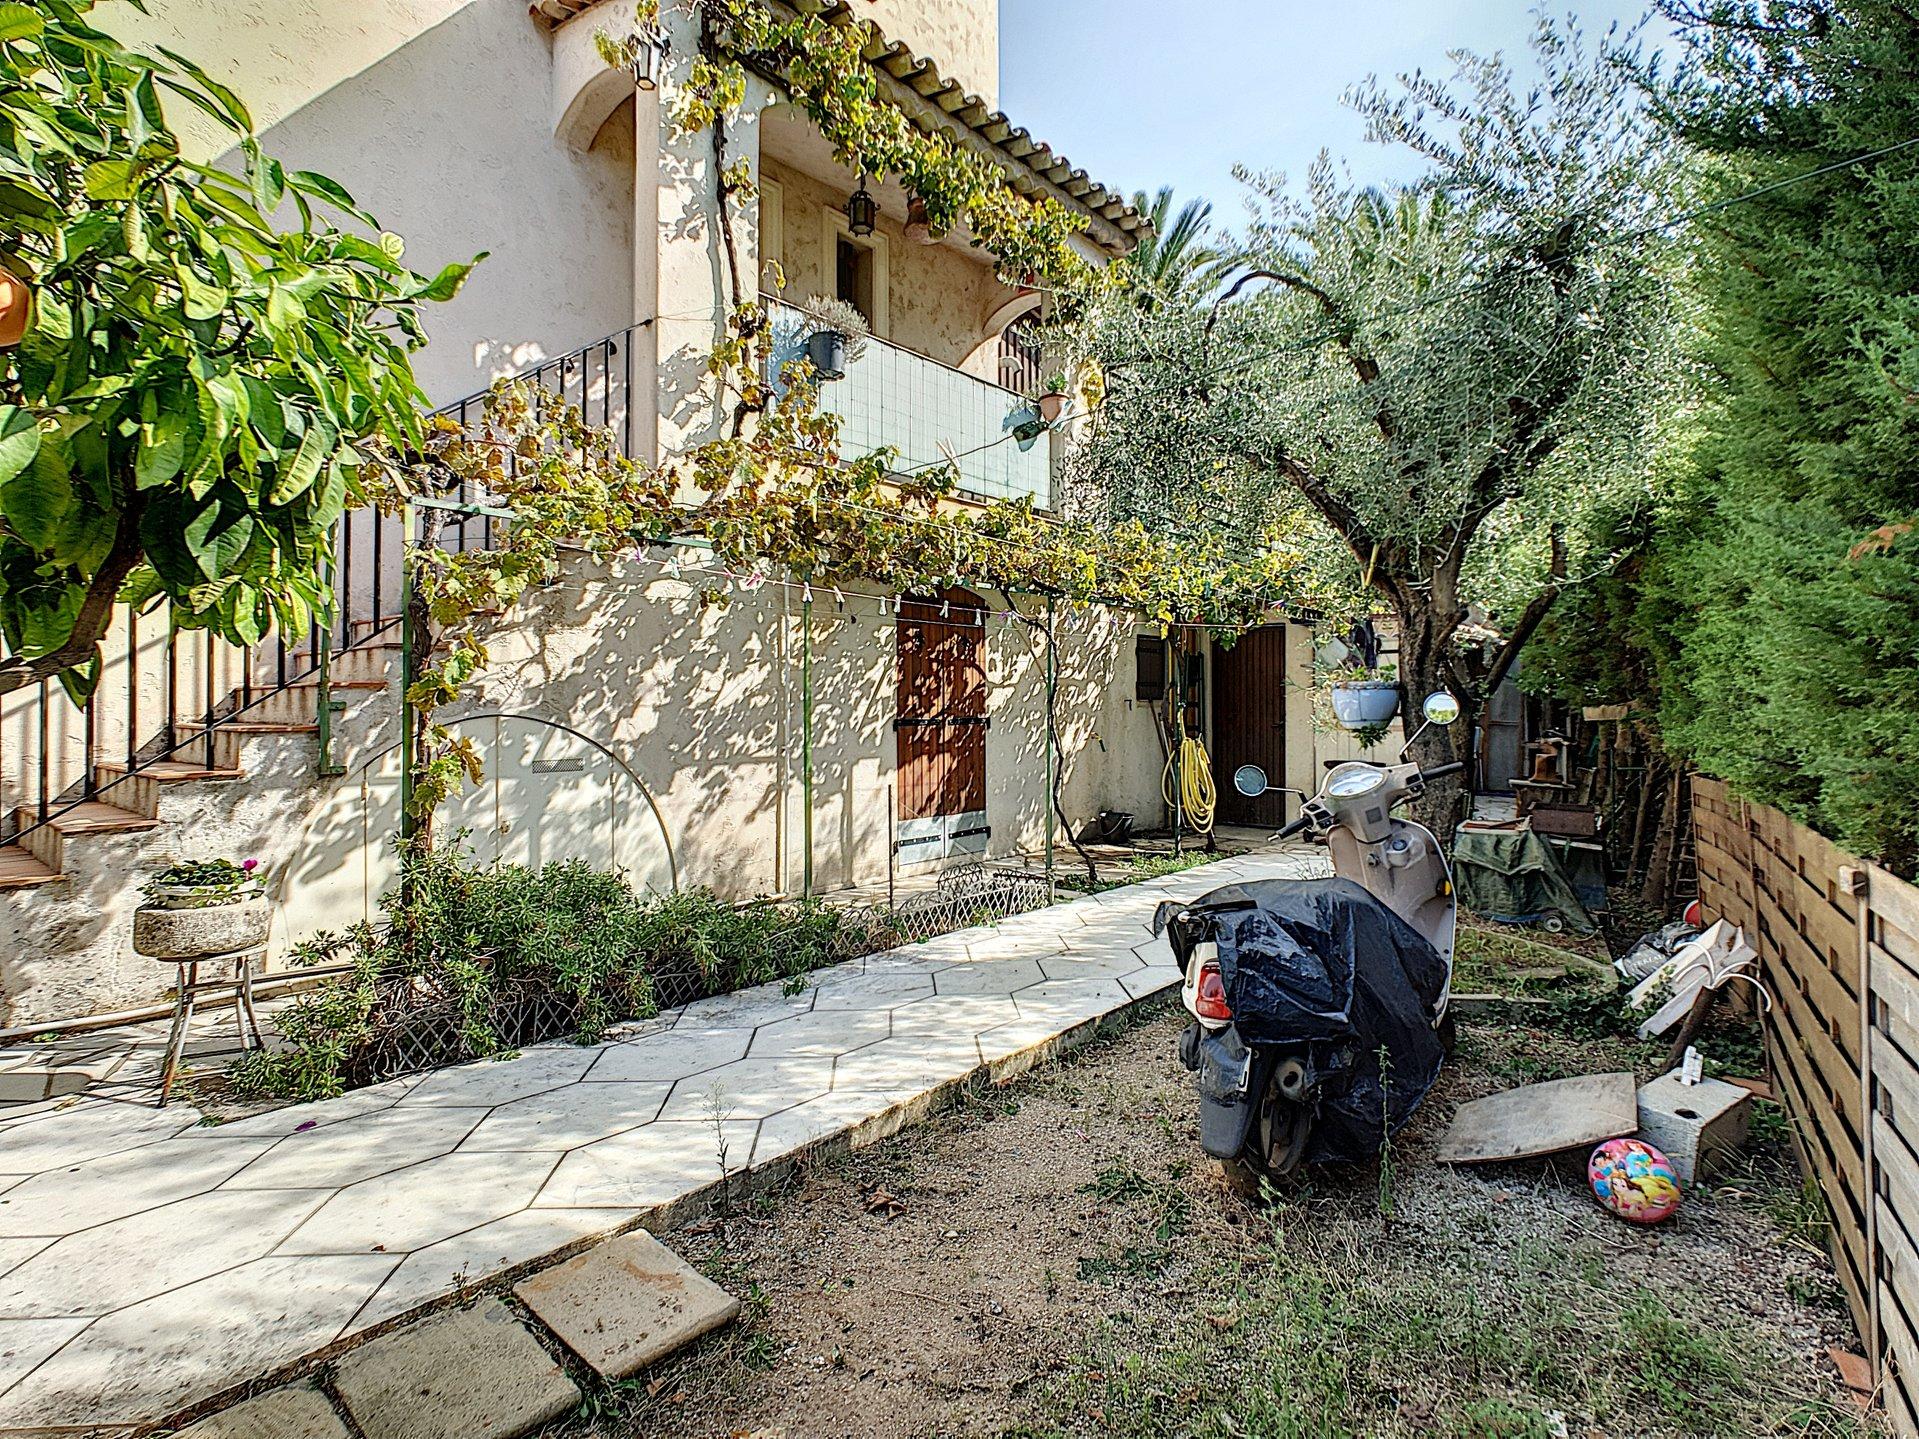 Property for sale in Cannes Croix des Gardes